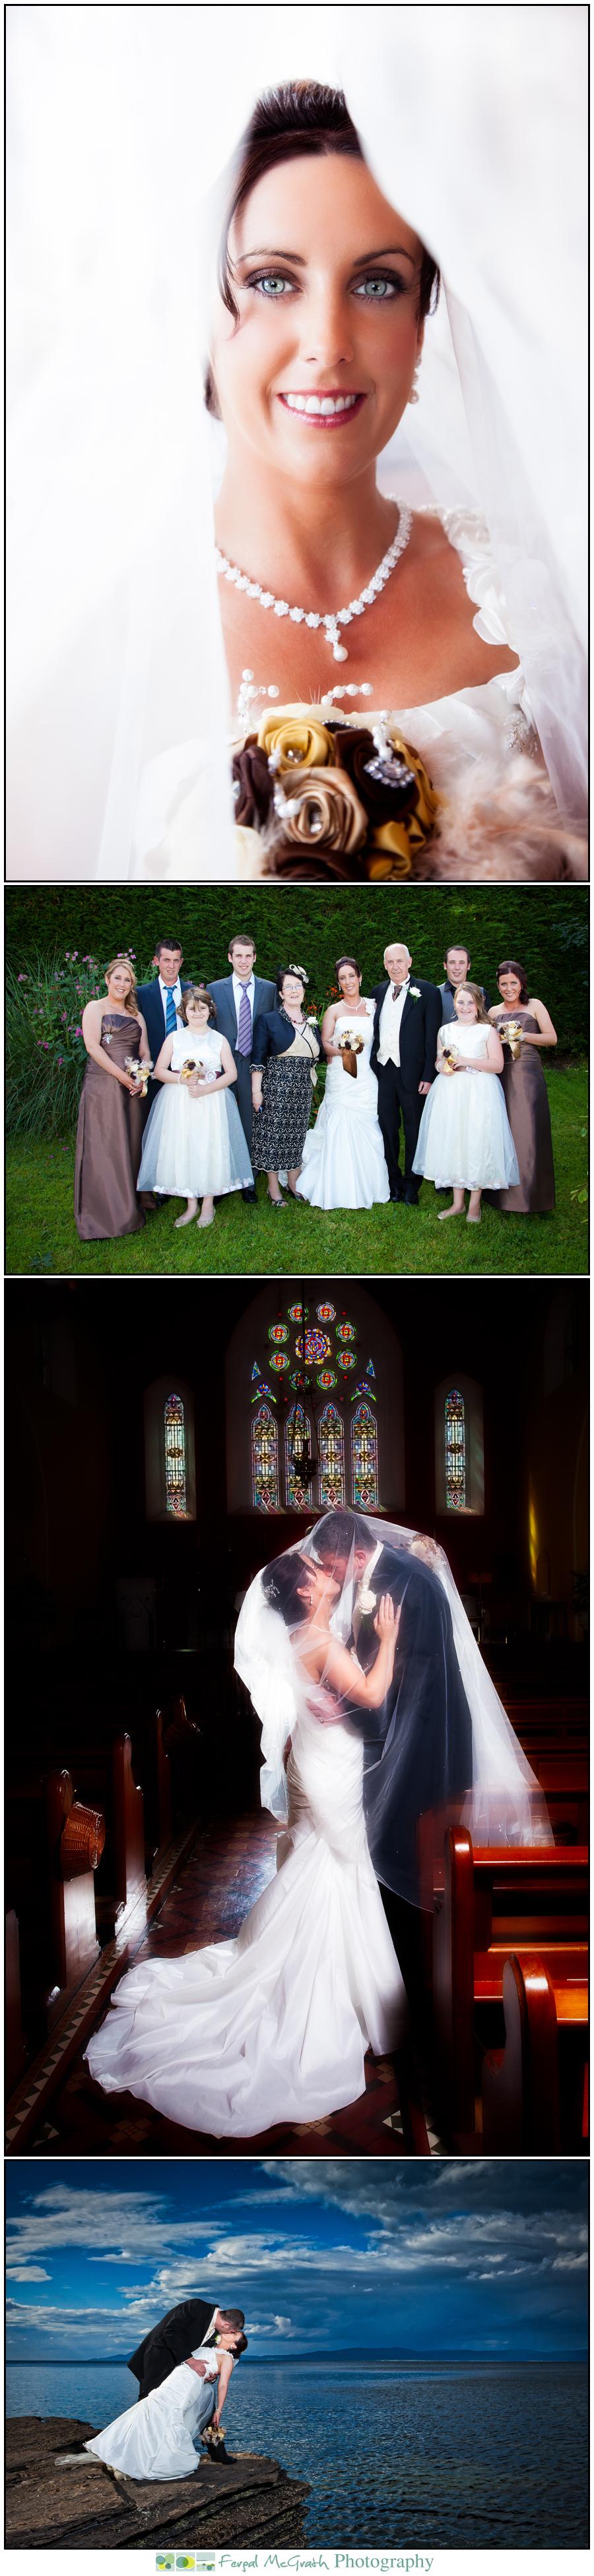 Leitrim Wedding Photographer